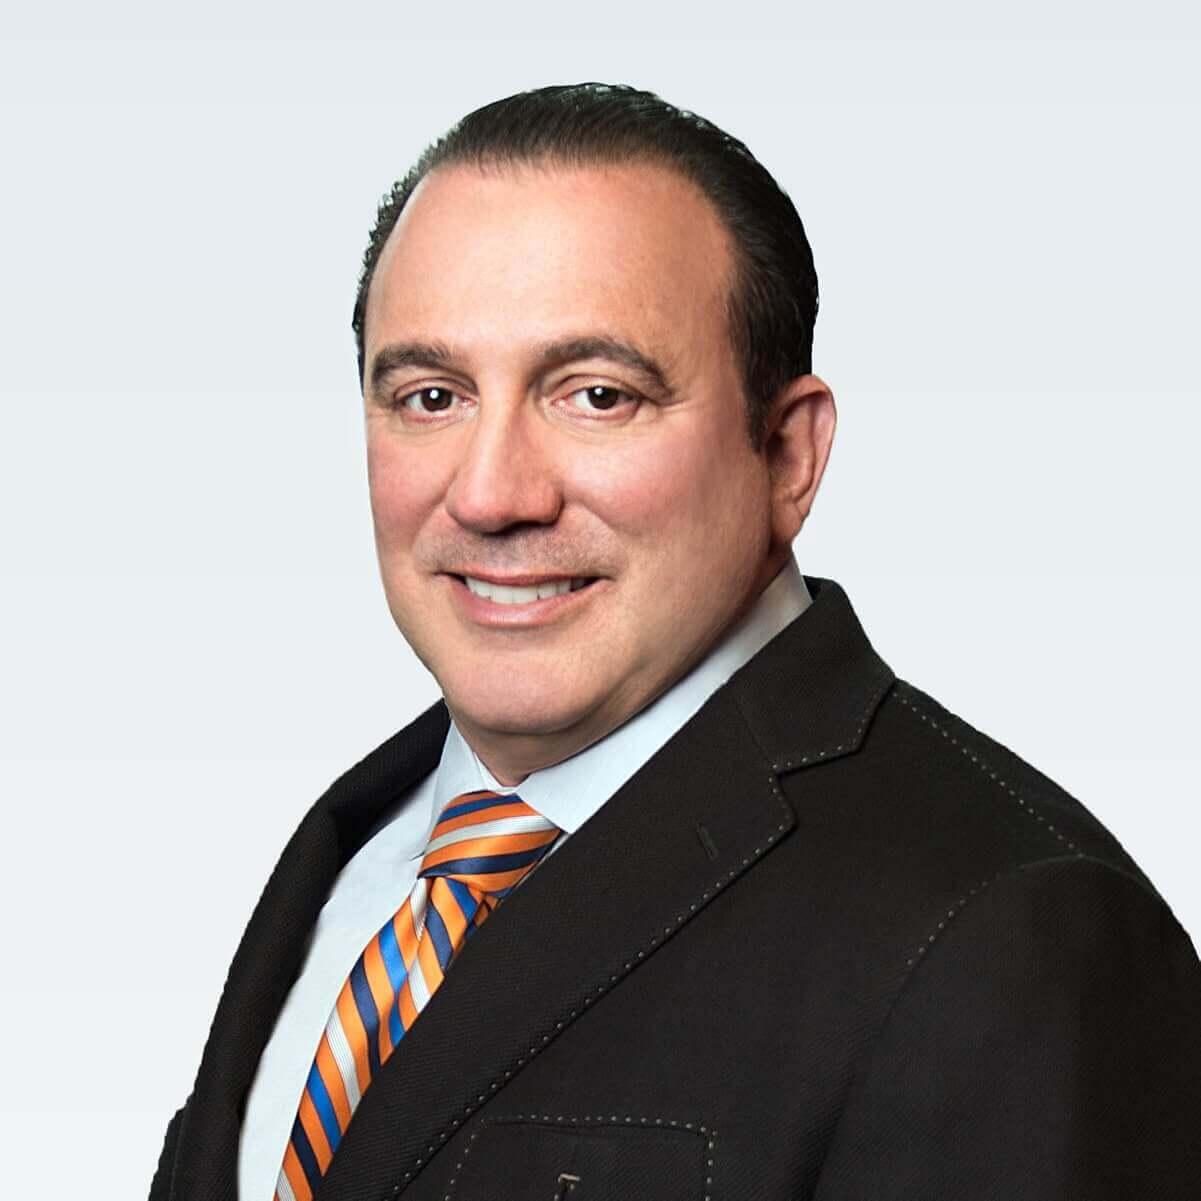 Michael Iaccarino